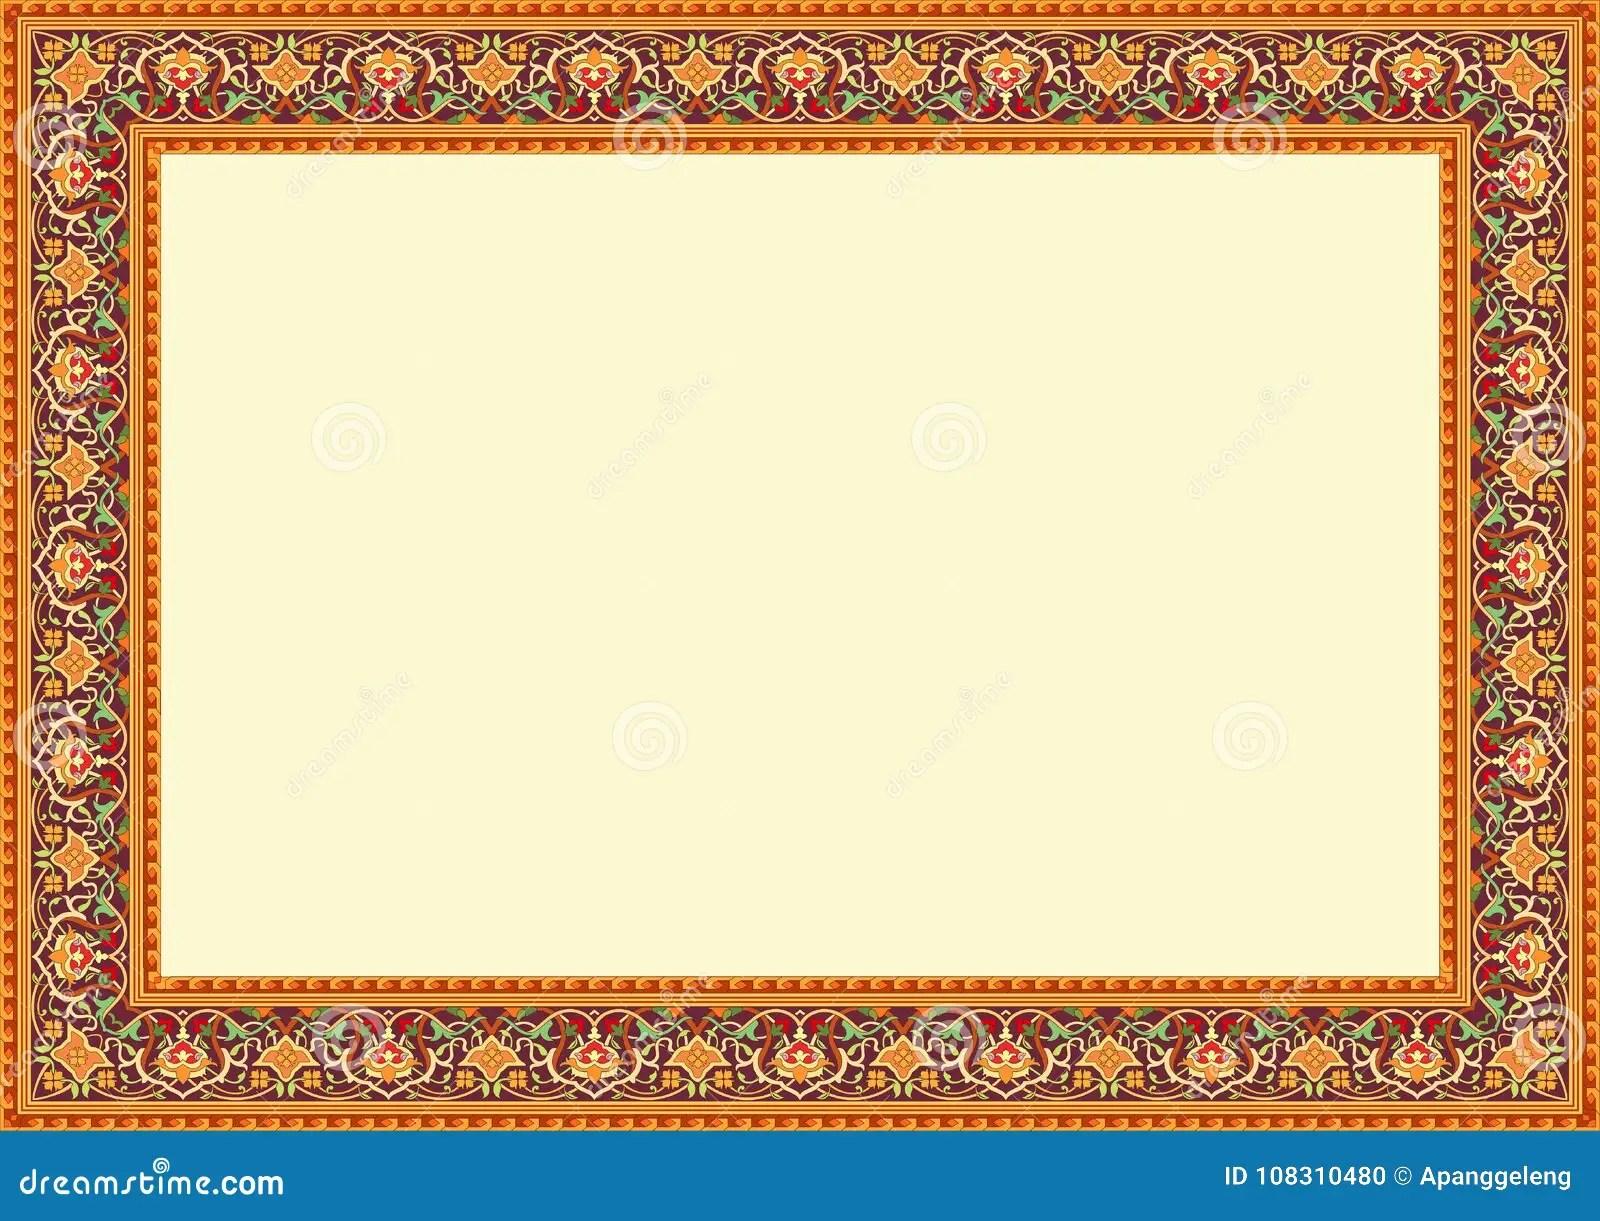 Islamic Wall Hanging Frames - Castrophotos